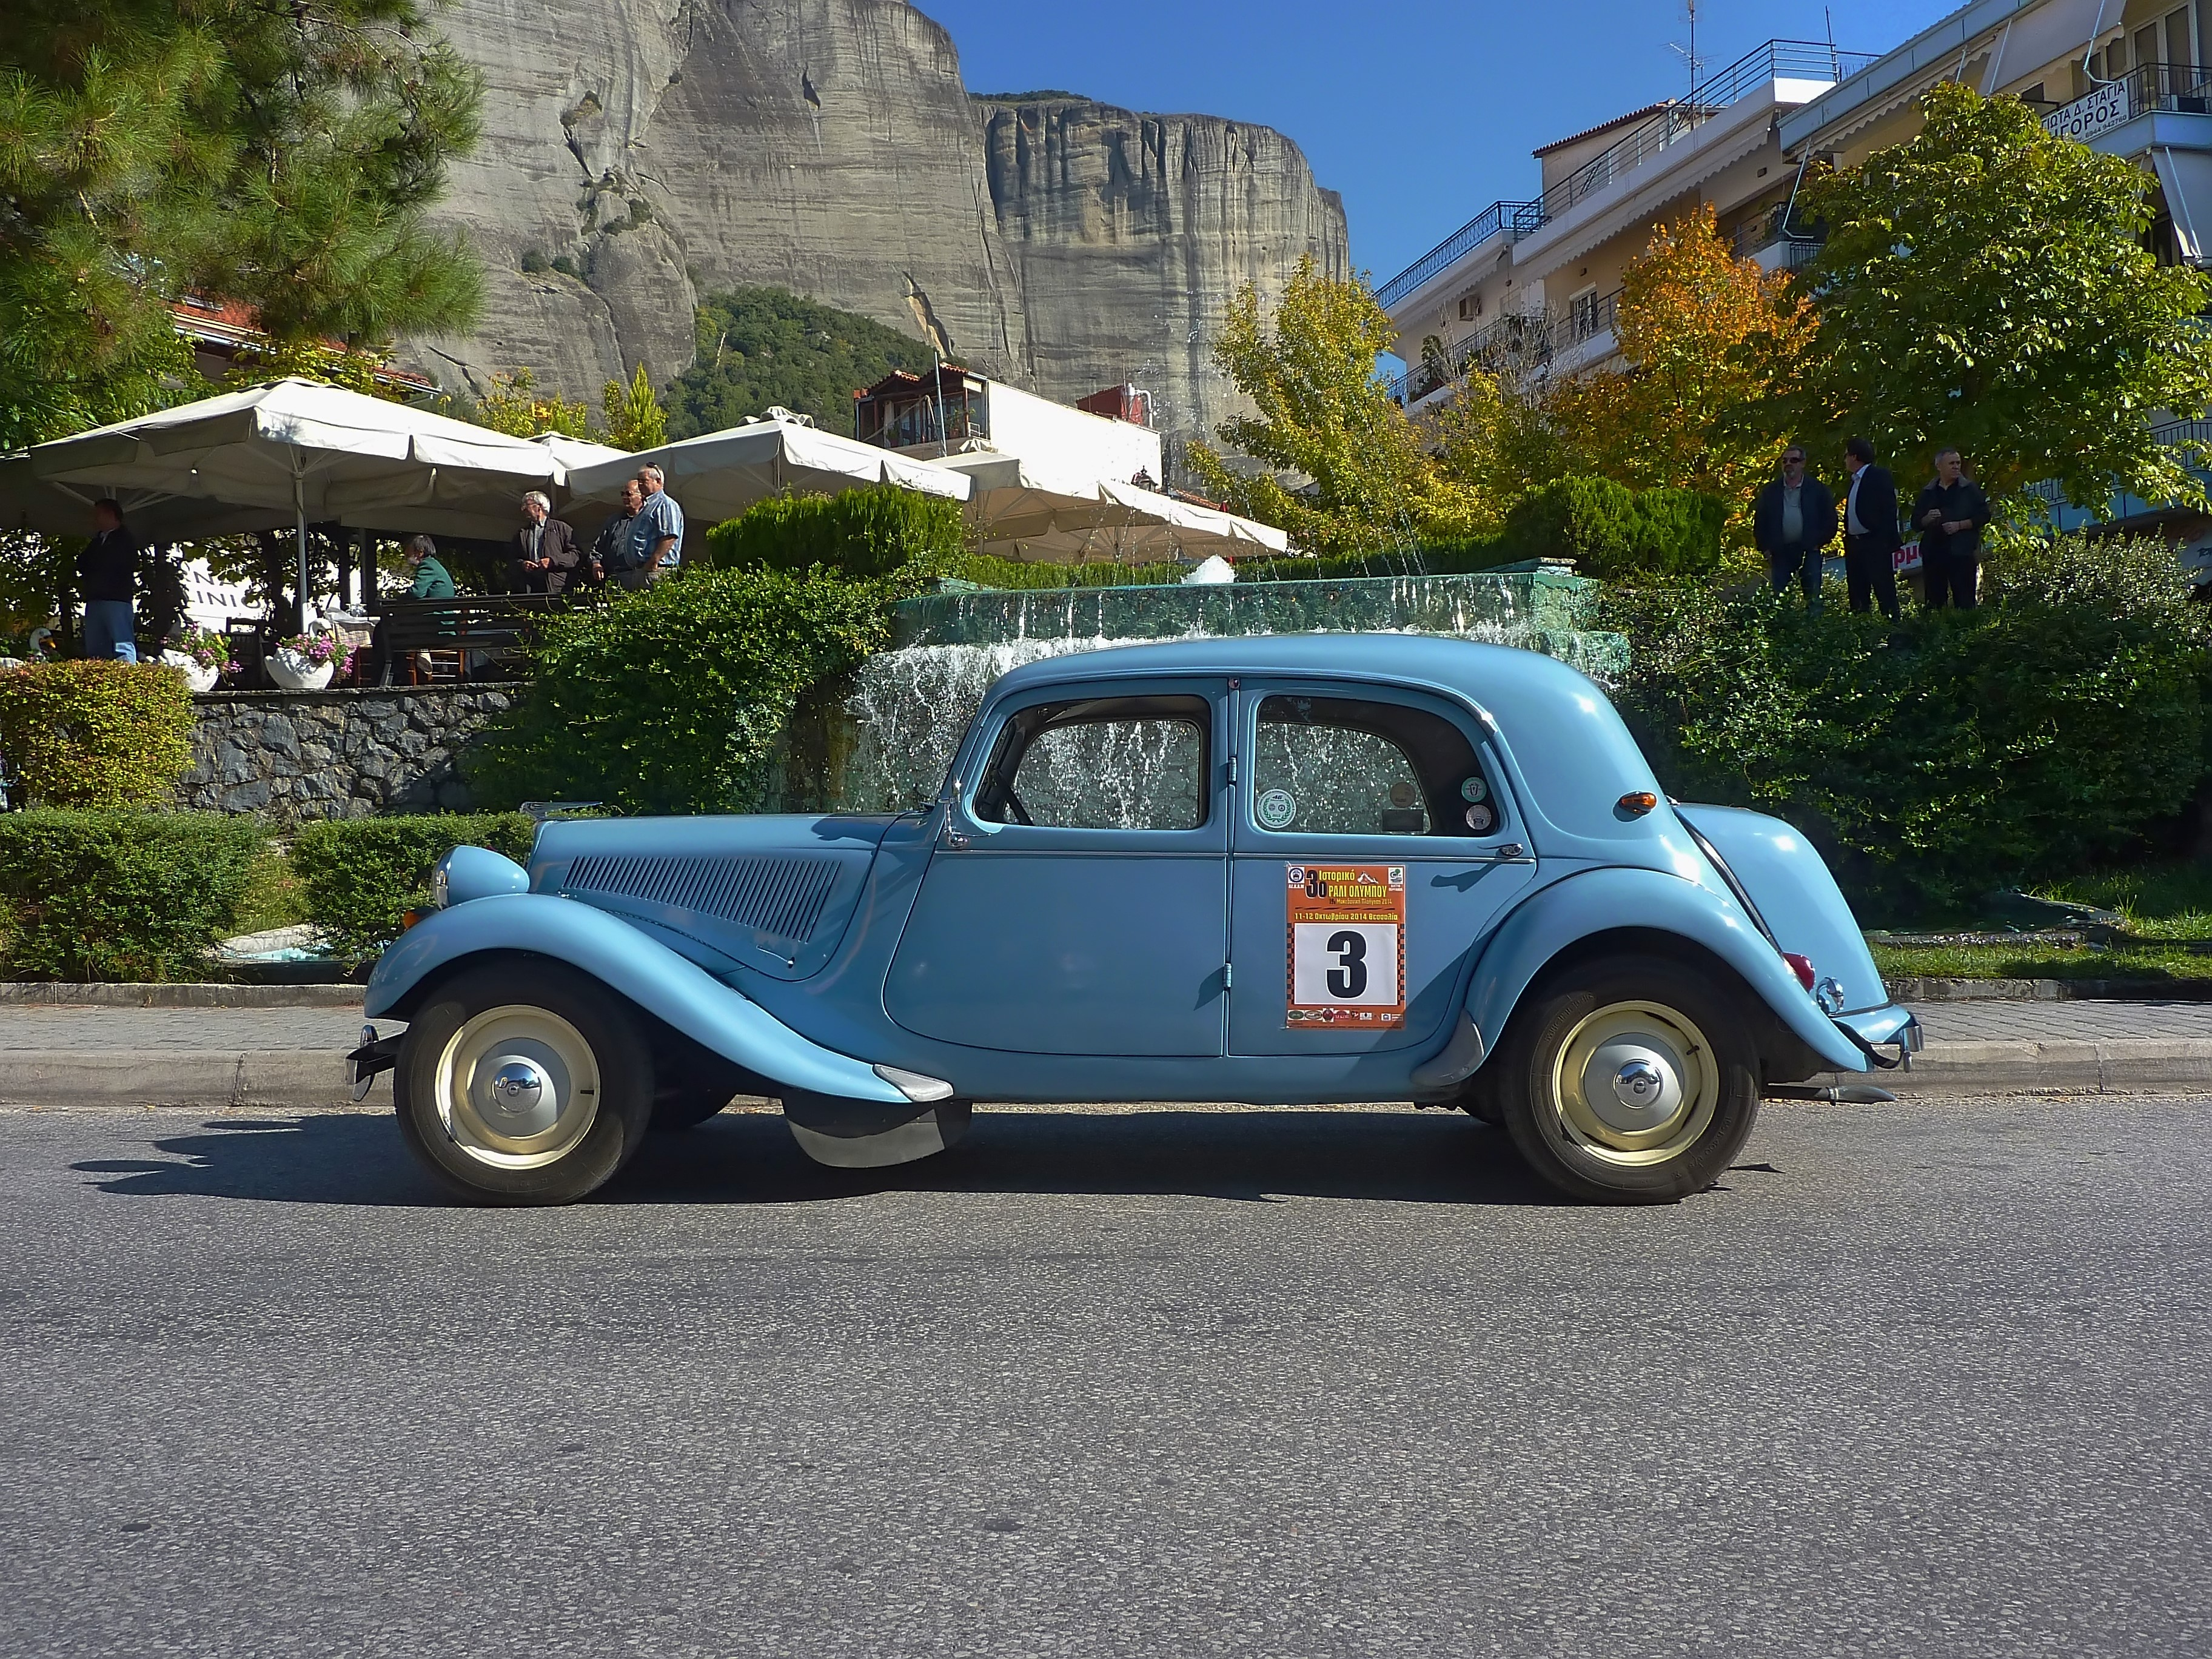 1954 Citroen Traction Avant 11BL  (29)